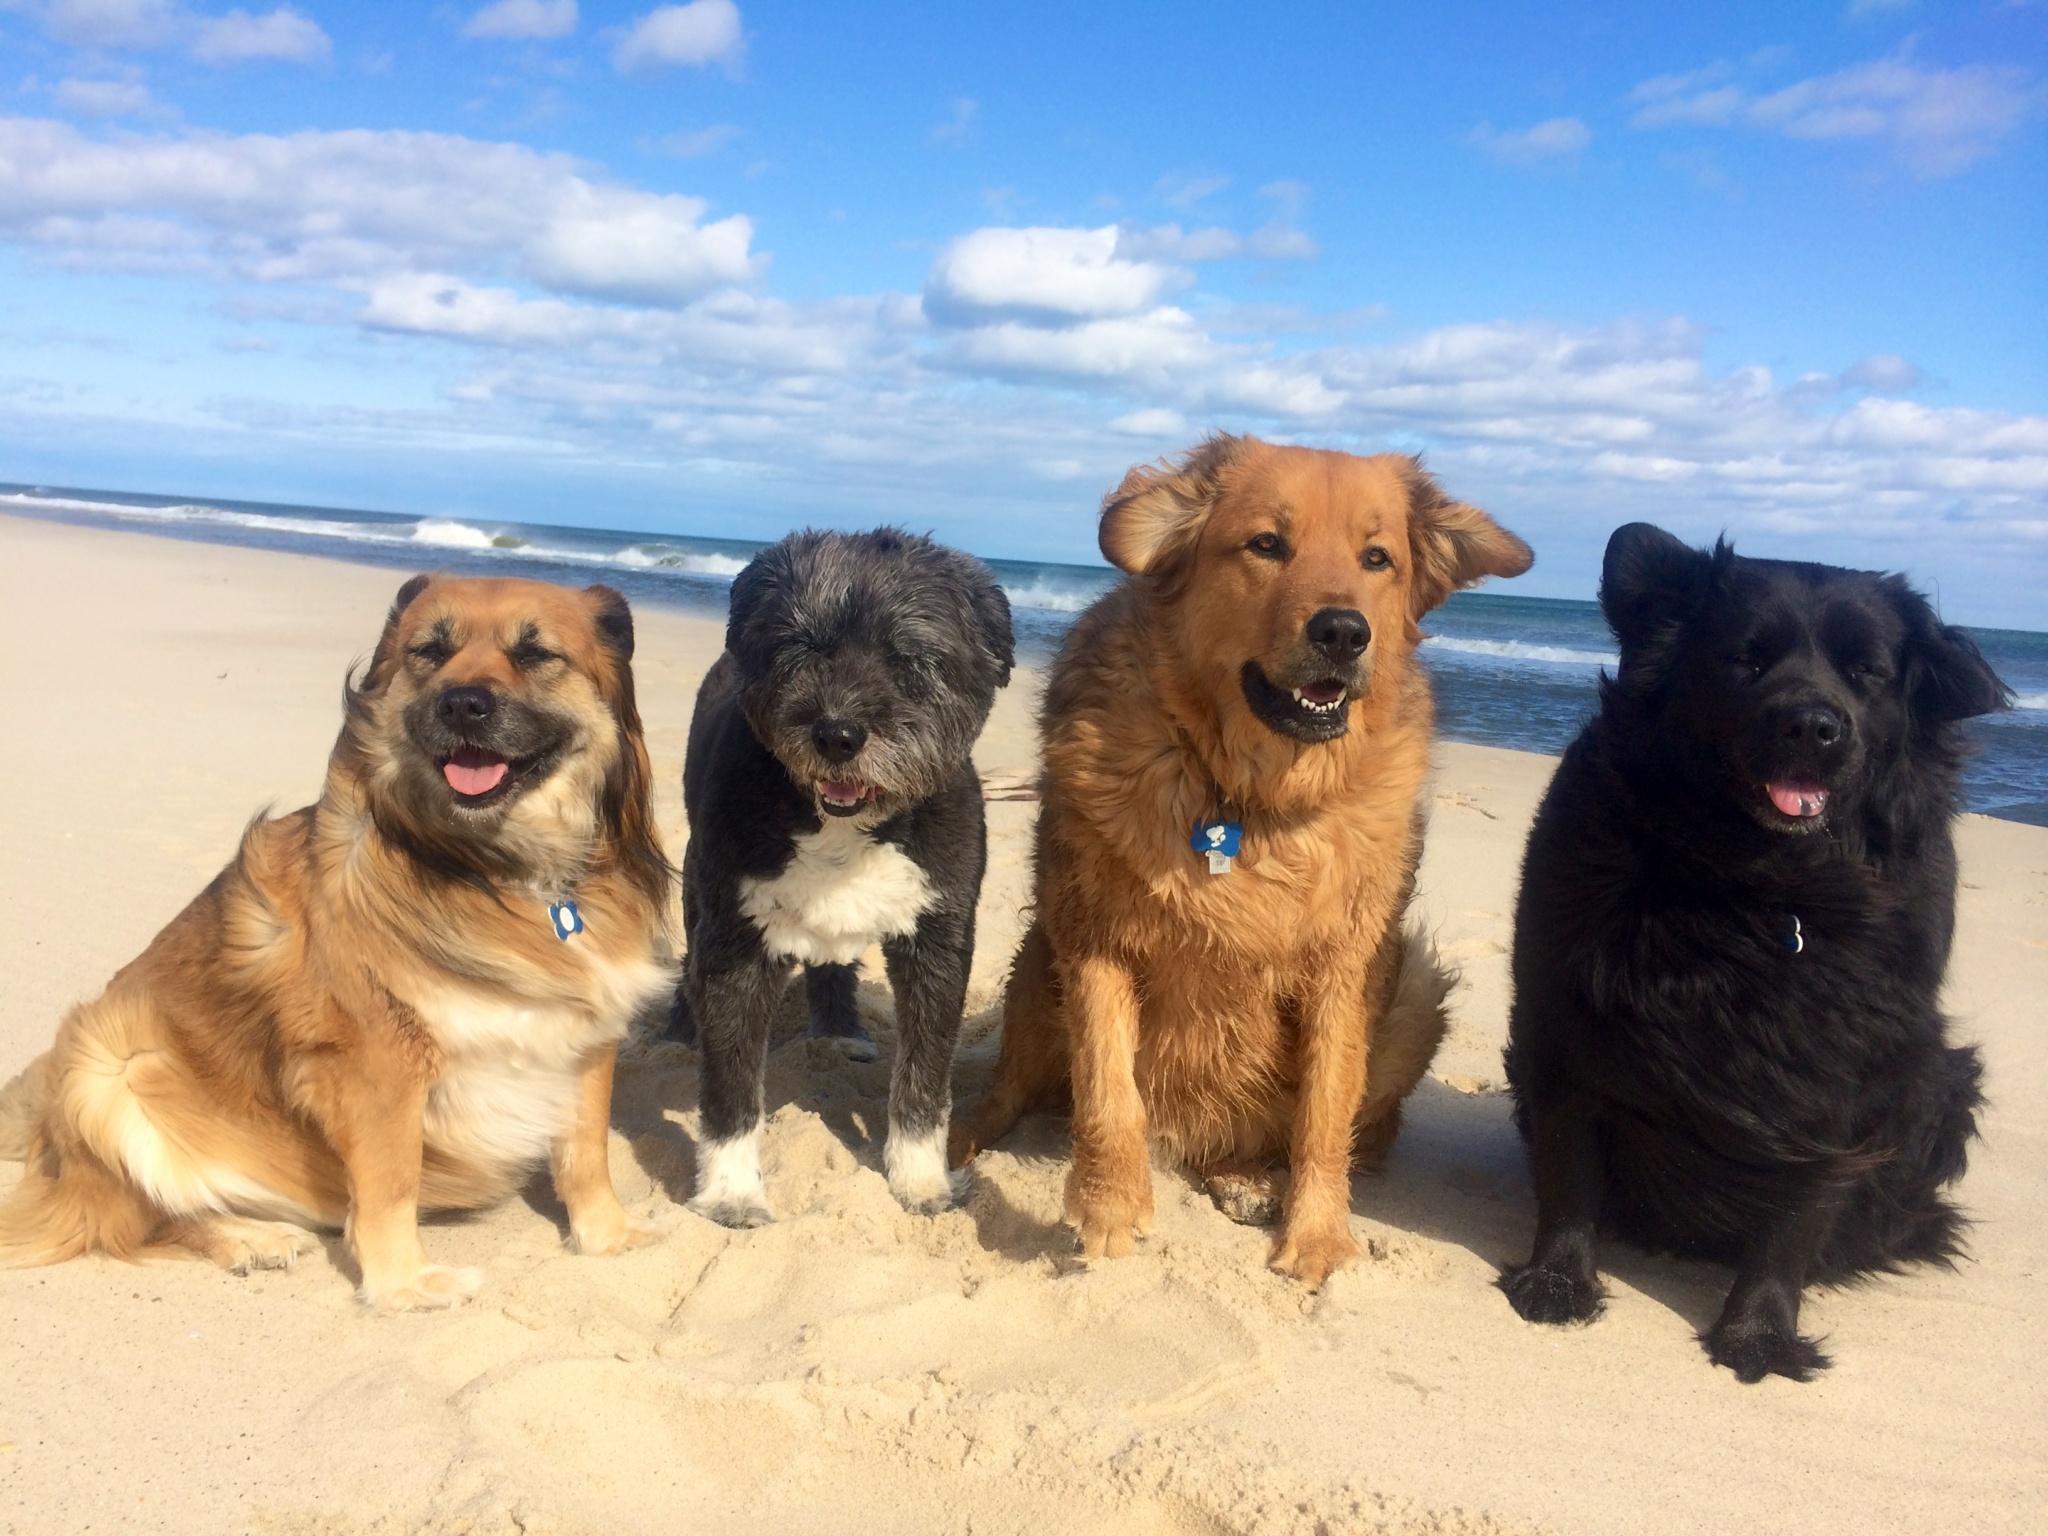 Me + 4 dogs on beach 8